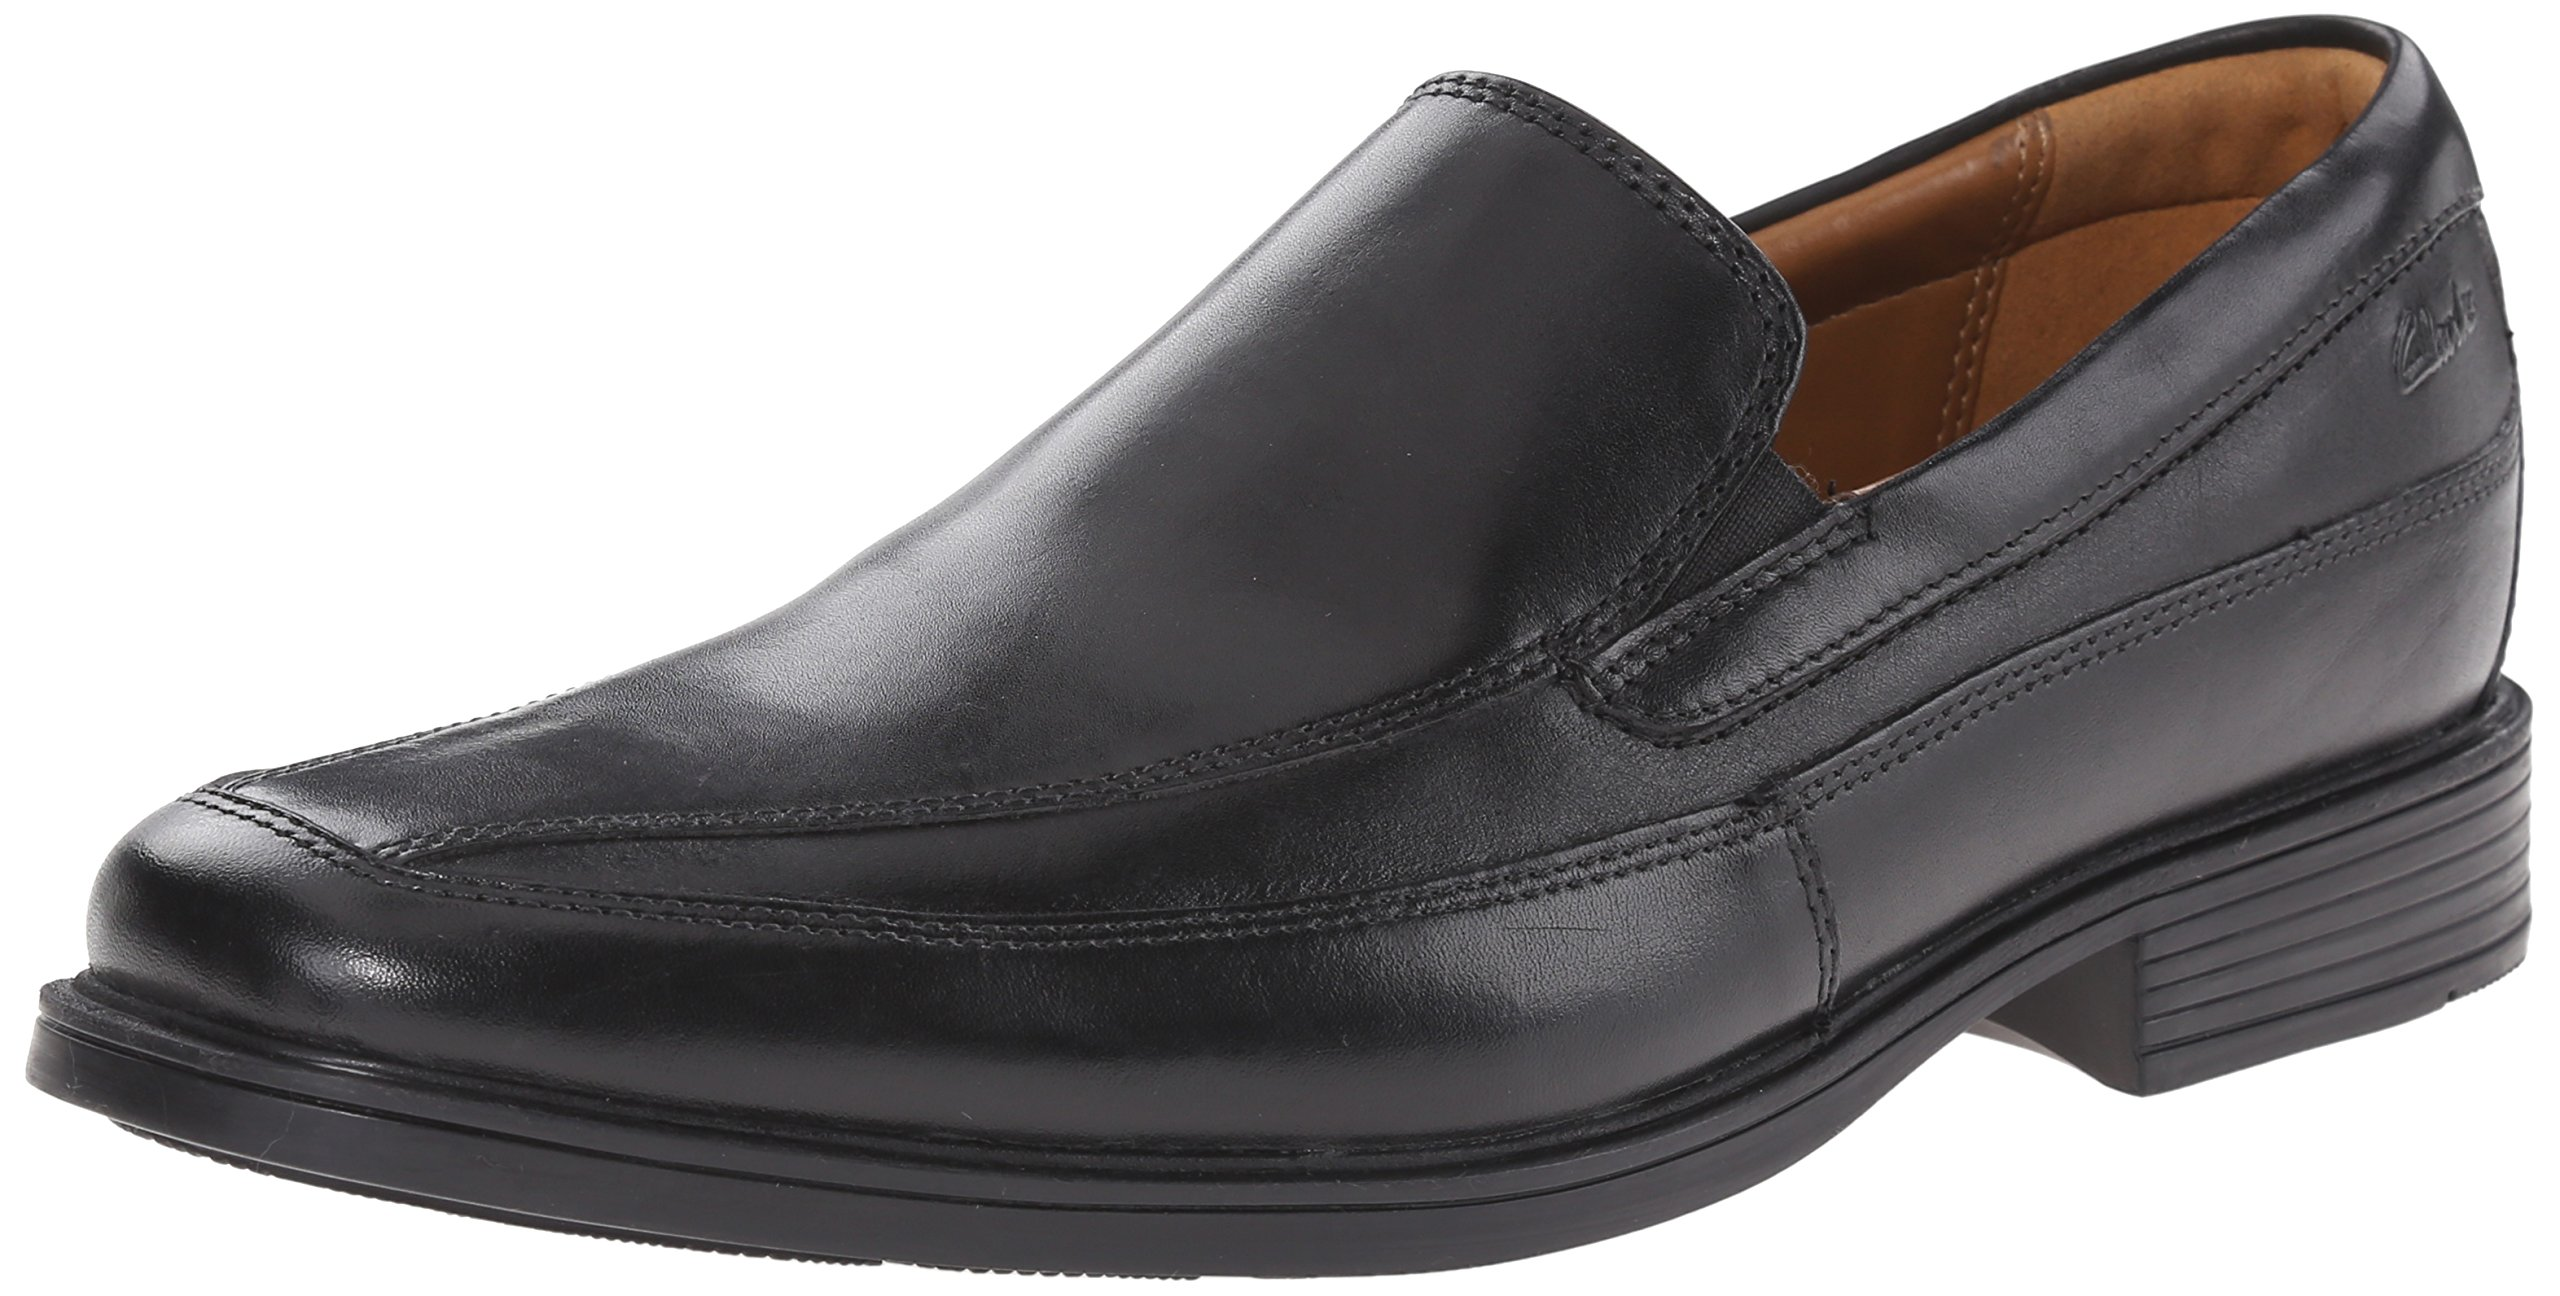 CLARKS Men's Tilden Free Slip-On Loafer, Black Leather, 10.5 M US